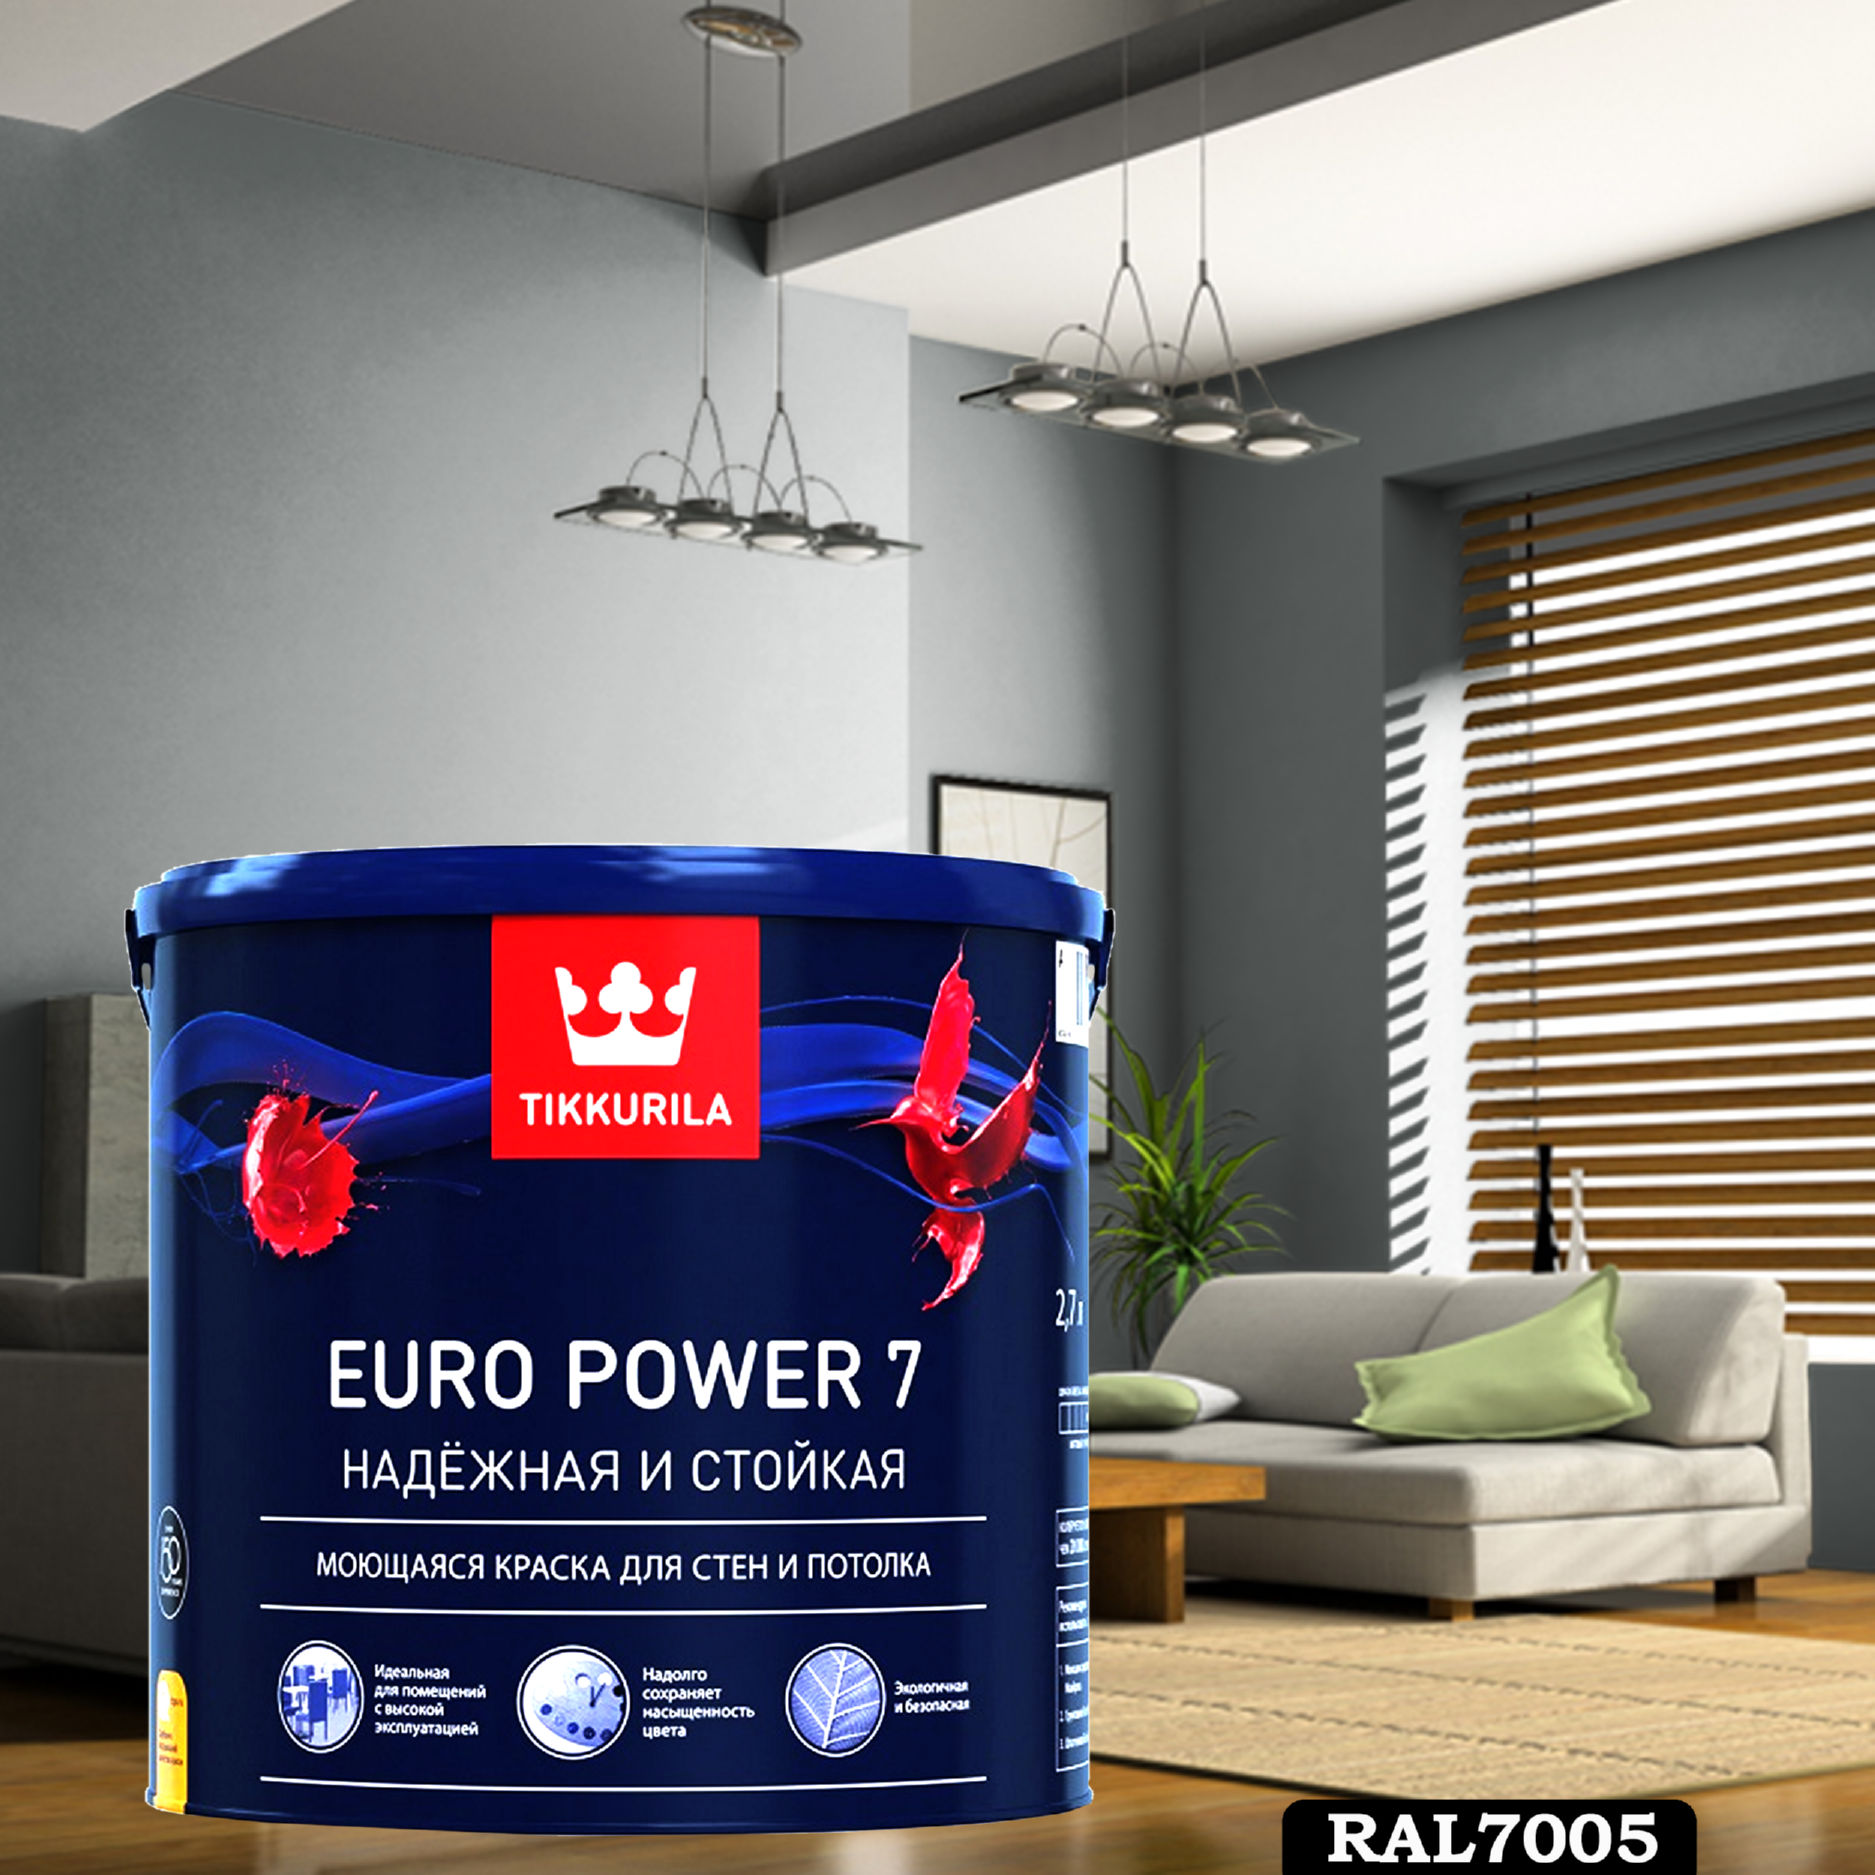 Фото 6 - Краска TIKKURILA Euro Power 7,  RAL 7005 Мышино-серый, латексная моющаяся матовая интерьерная, 9 л.